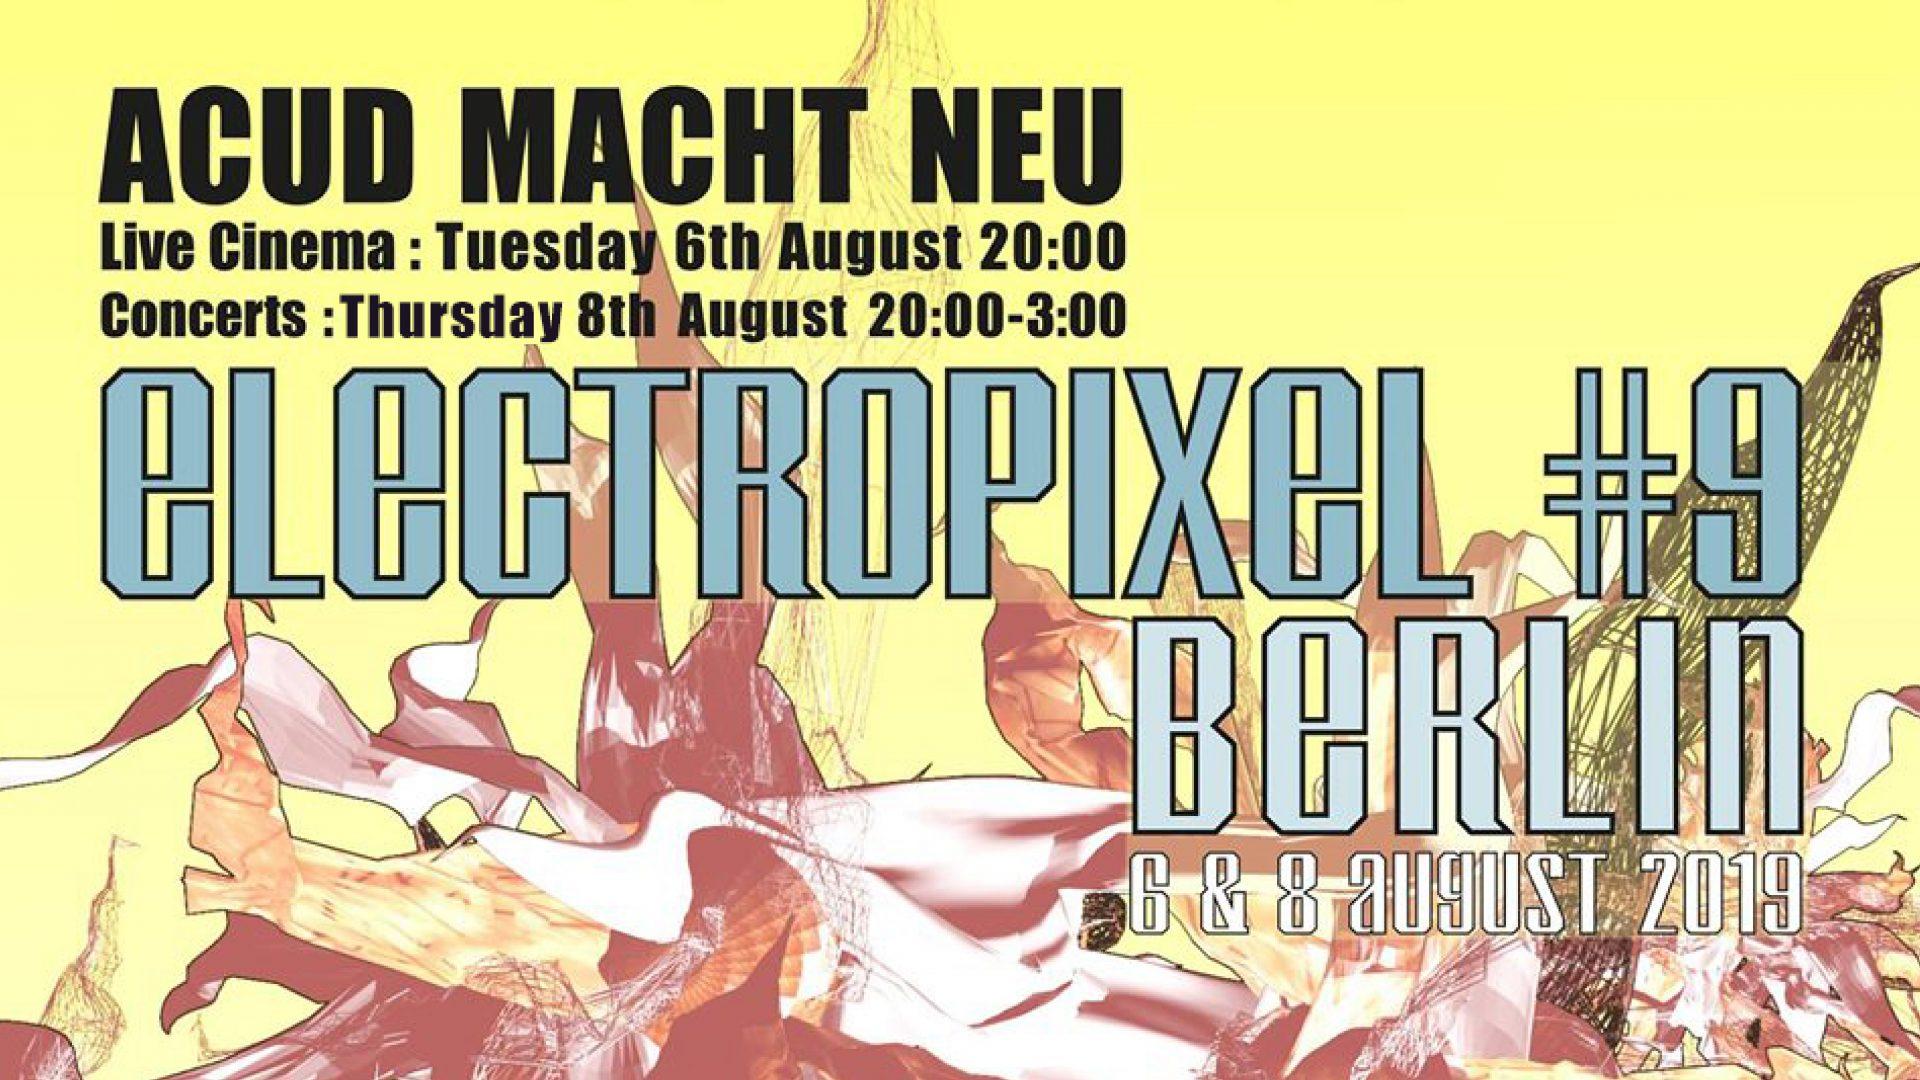 Electropixel-Berlin – Transformation of Cinema | ACUD MACHT NEU